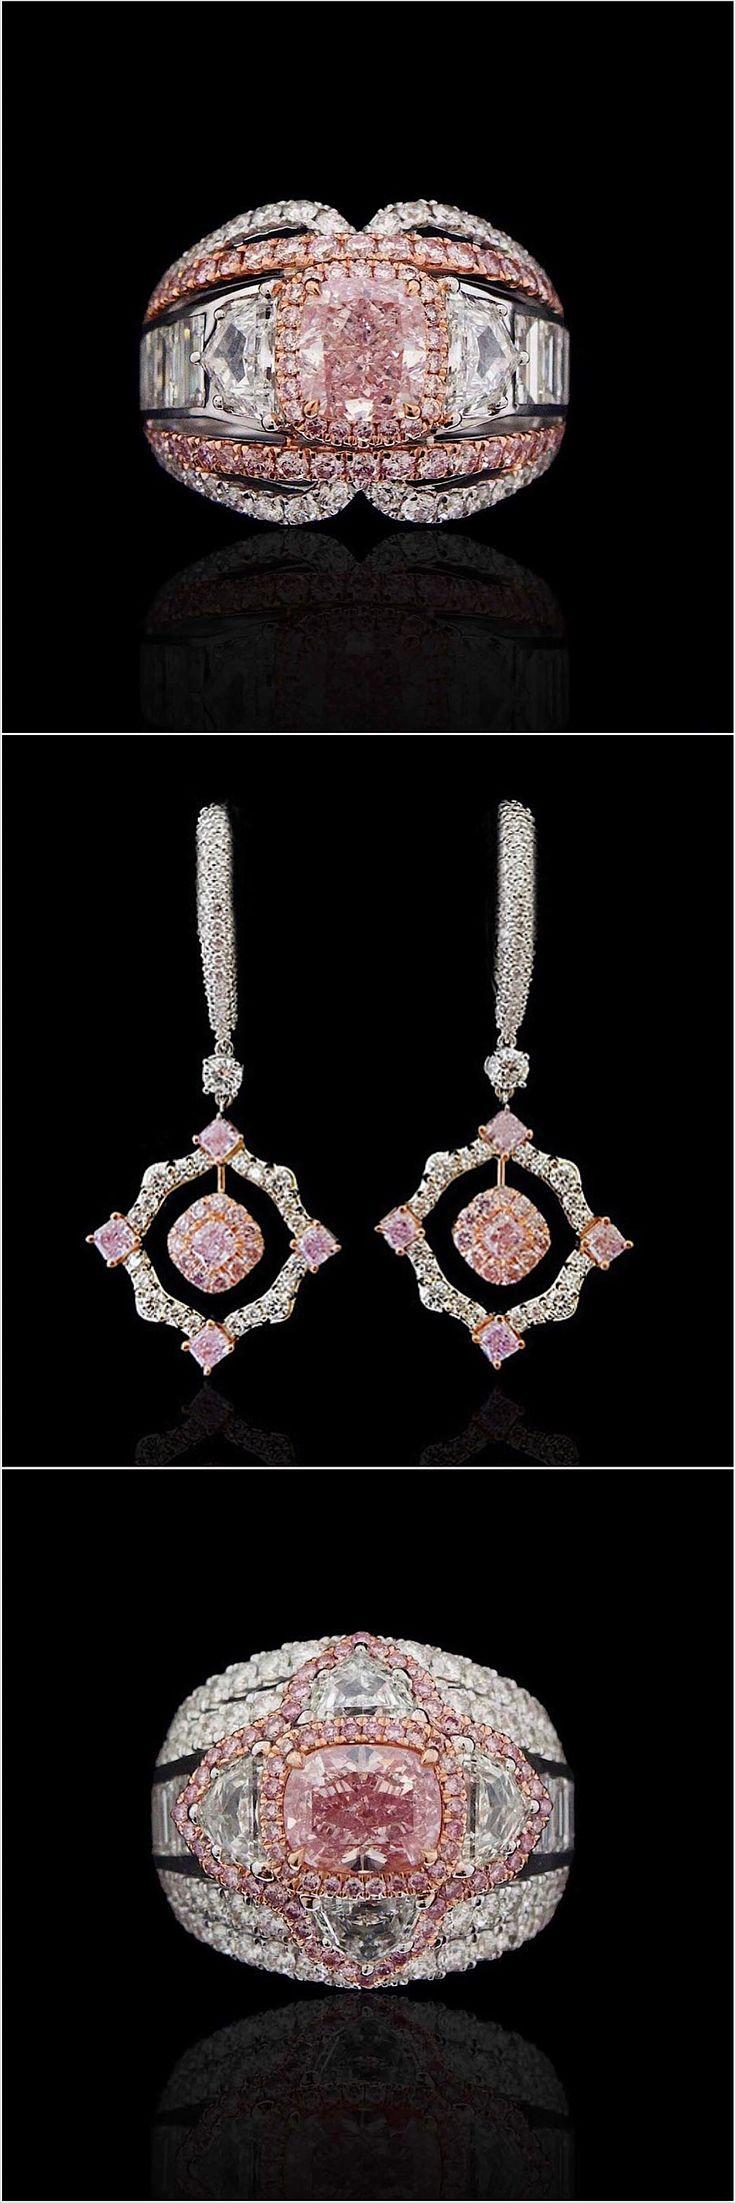 1.) 1.32 carat Fancy Intense Purple Pink diamond ring. 2.) Fancy Pink Diamond Drop Earrings 3.) A rare Fancy Intense Purple Pink diamond, over 1.50 carats in size, sits in a suitably royal setting. #novelcollectionny #naturalnovel #diamond #pinkdiamond #d